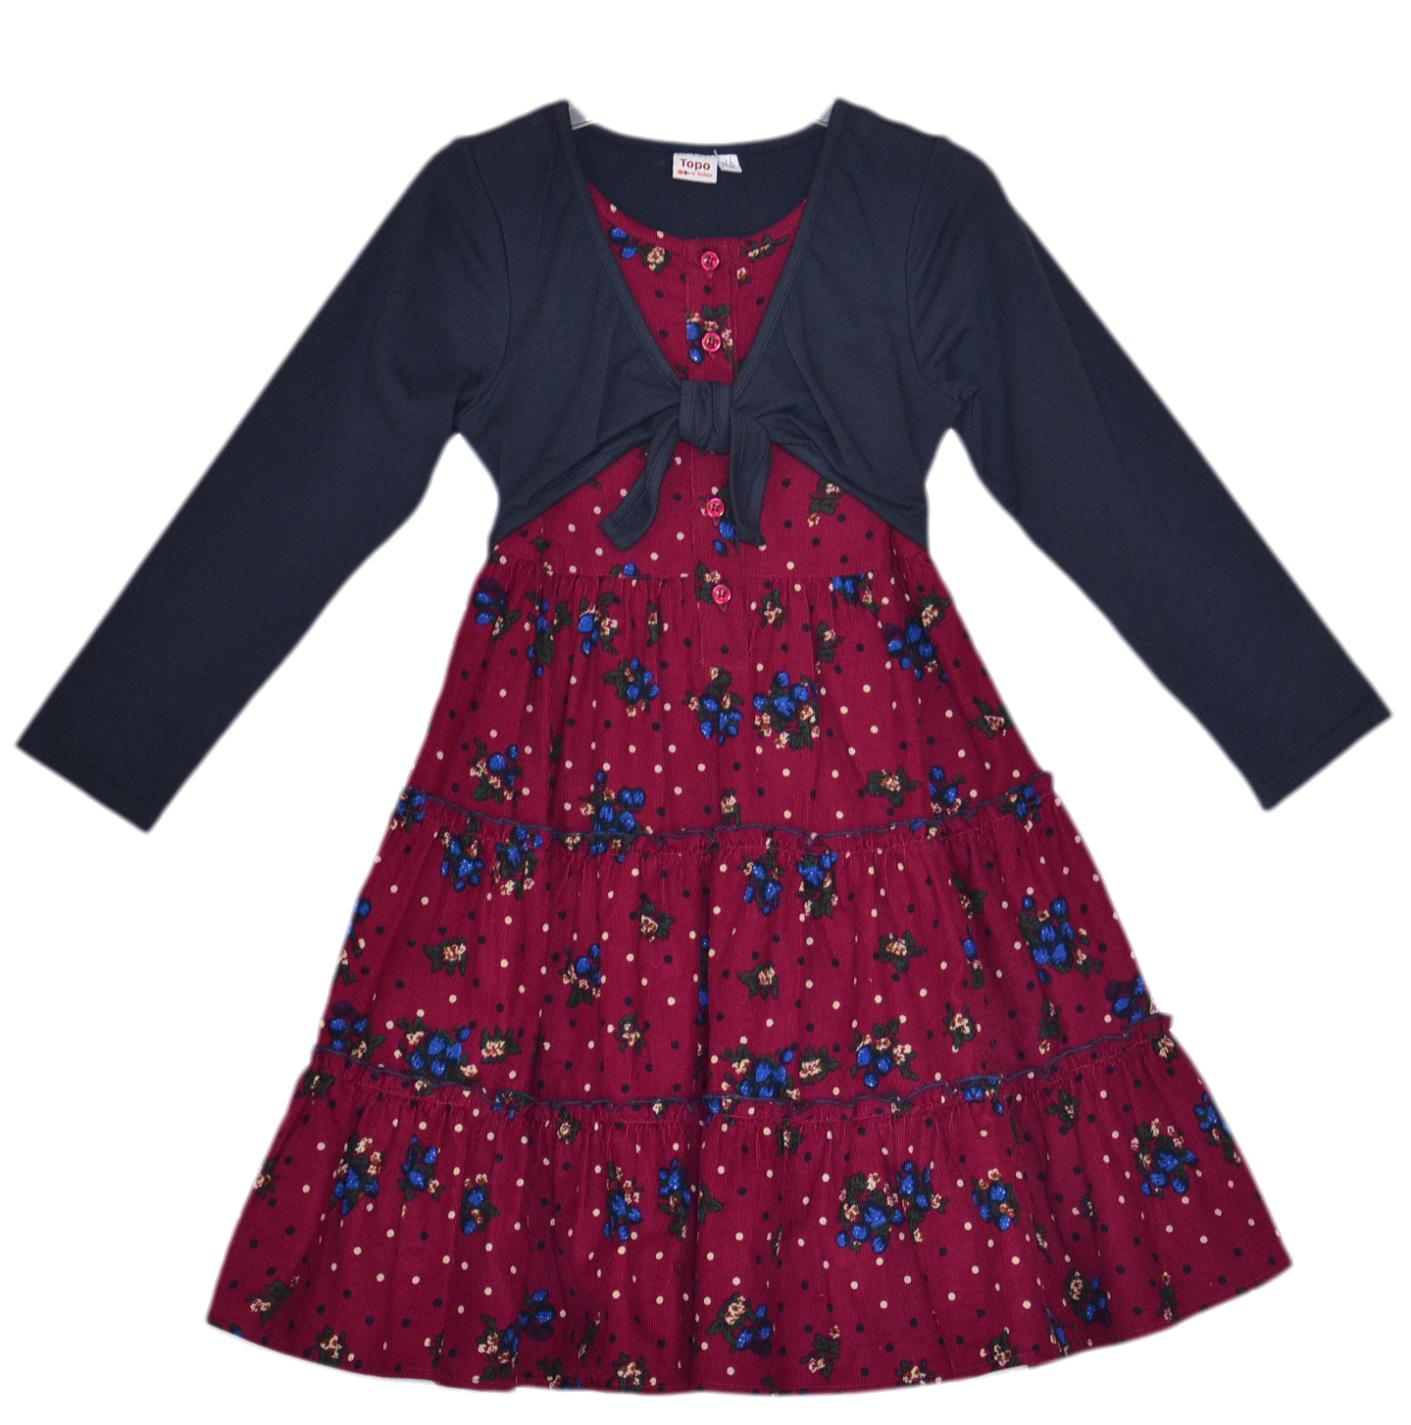 8d7c84478c96 Topo Dievčenské šaty s bolerkom - červené